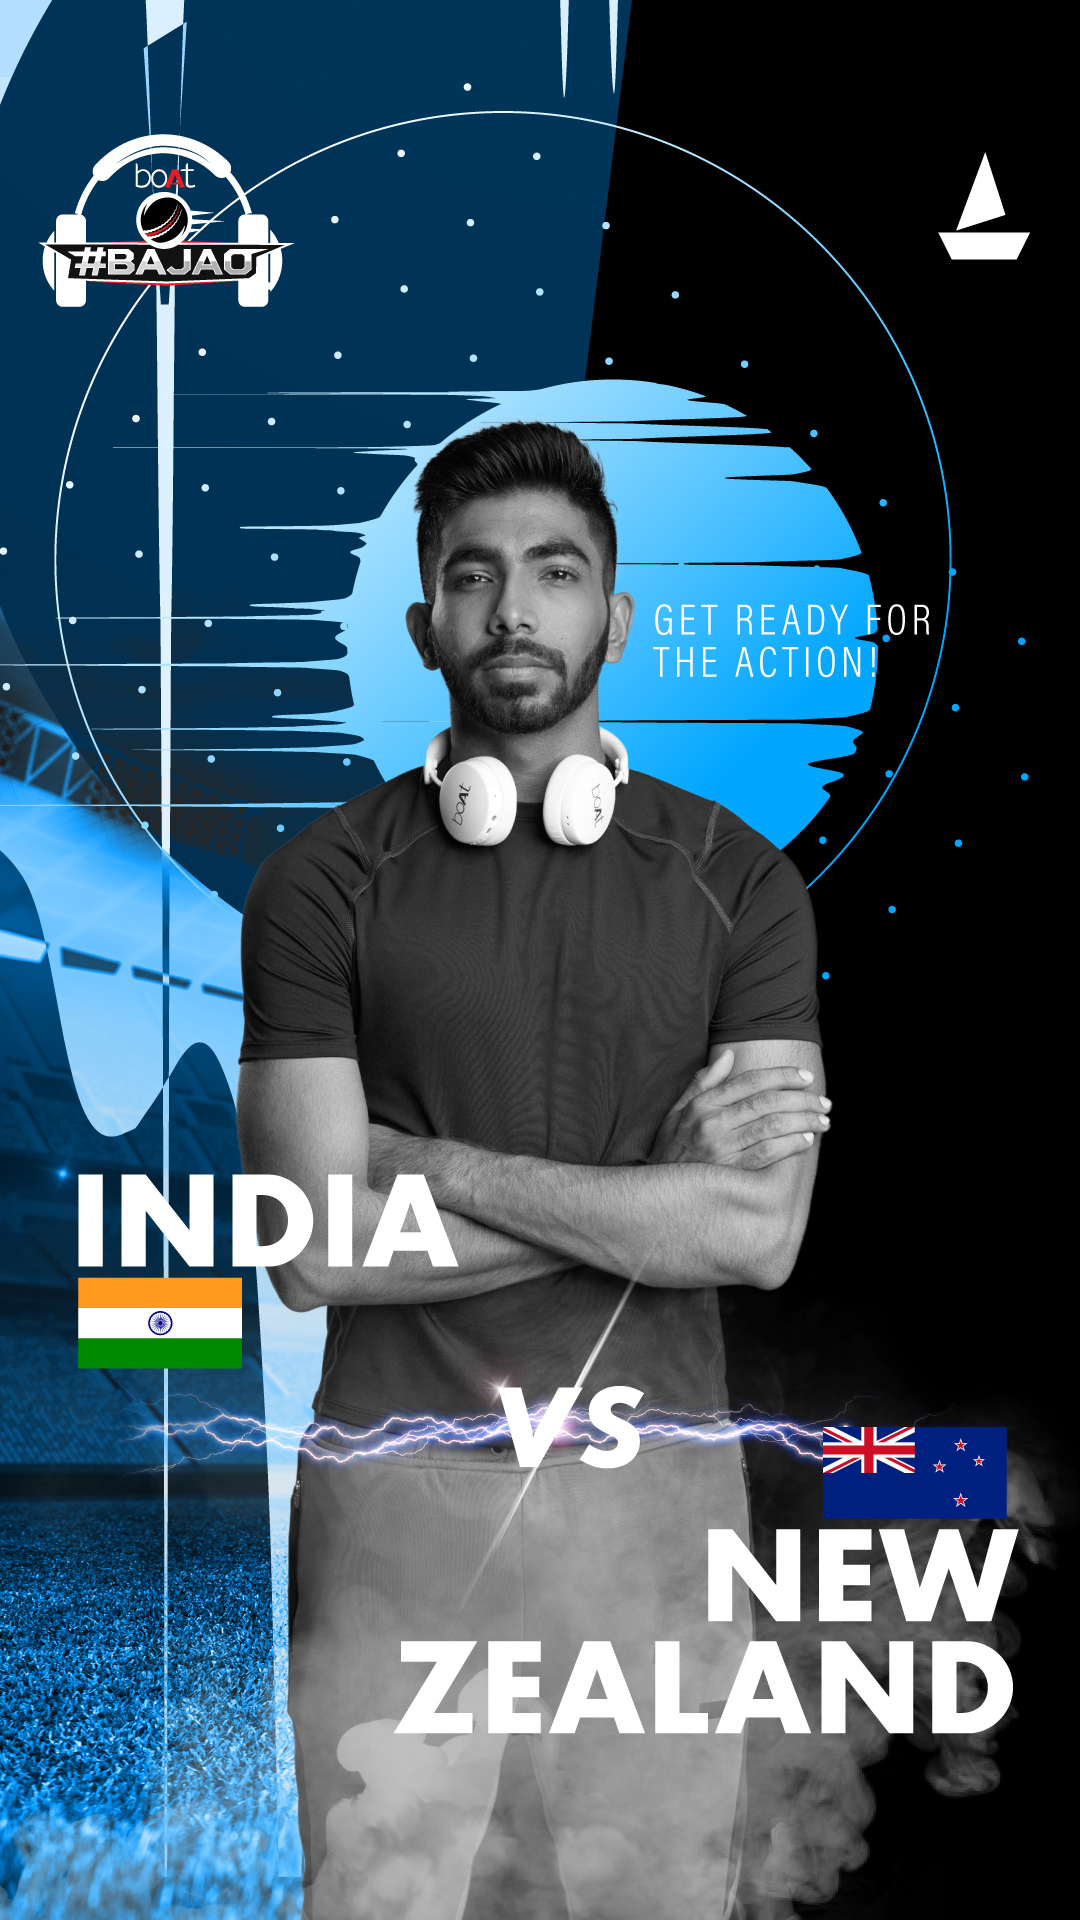 India-vs-NZ_1